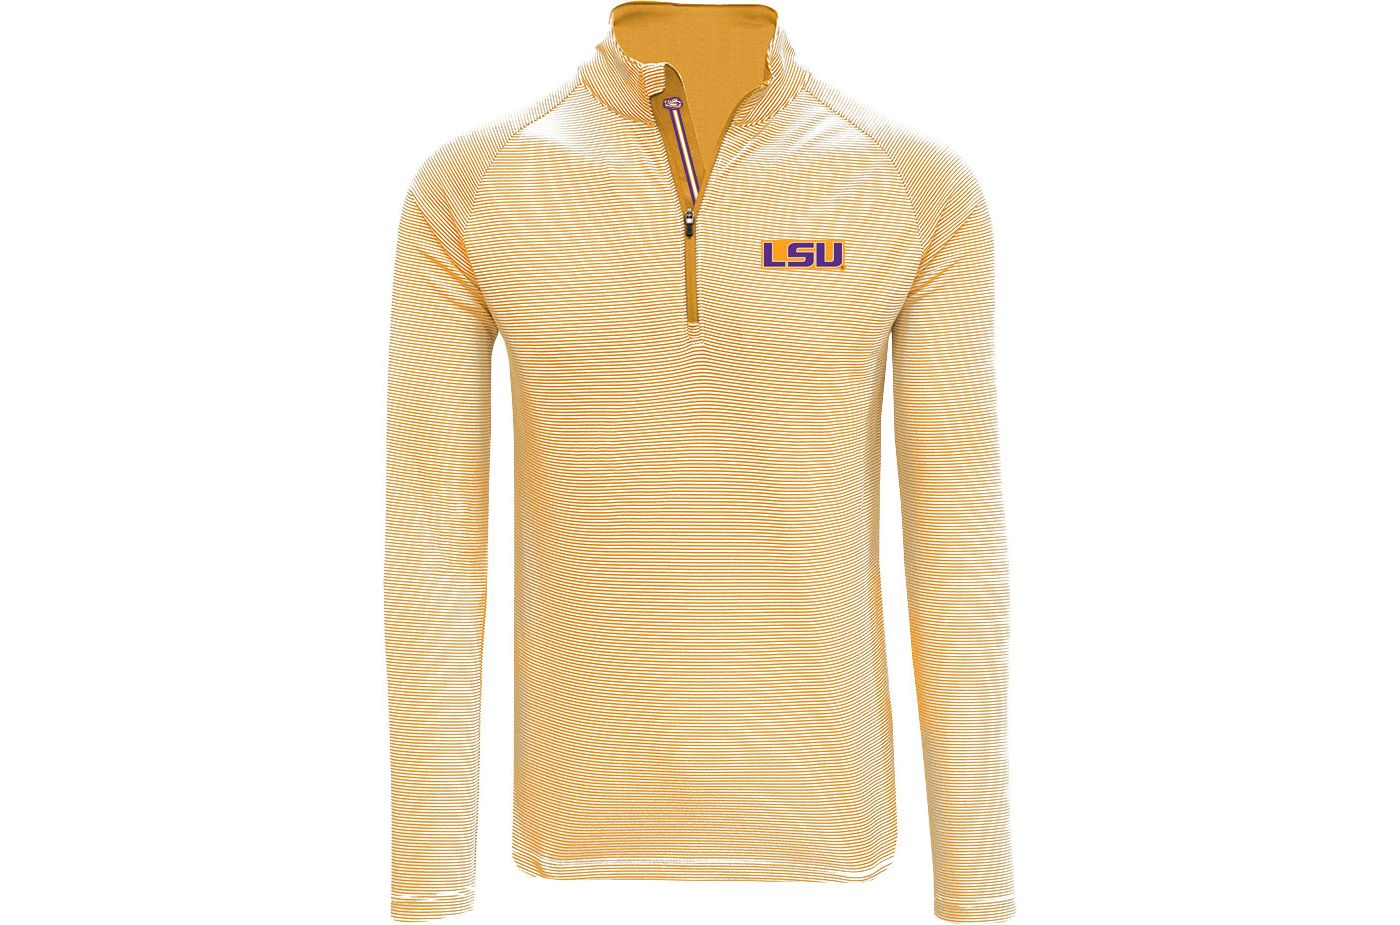 Levelwear Men's LSU Tigers Gold Orion Quarter-Zip Shirt